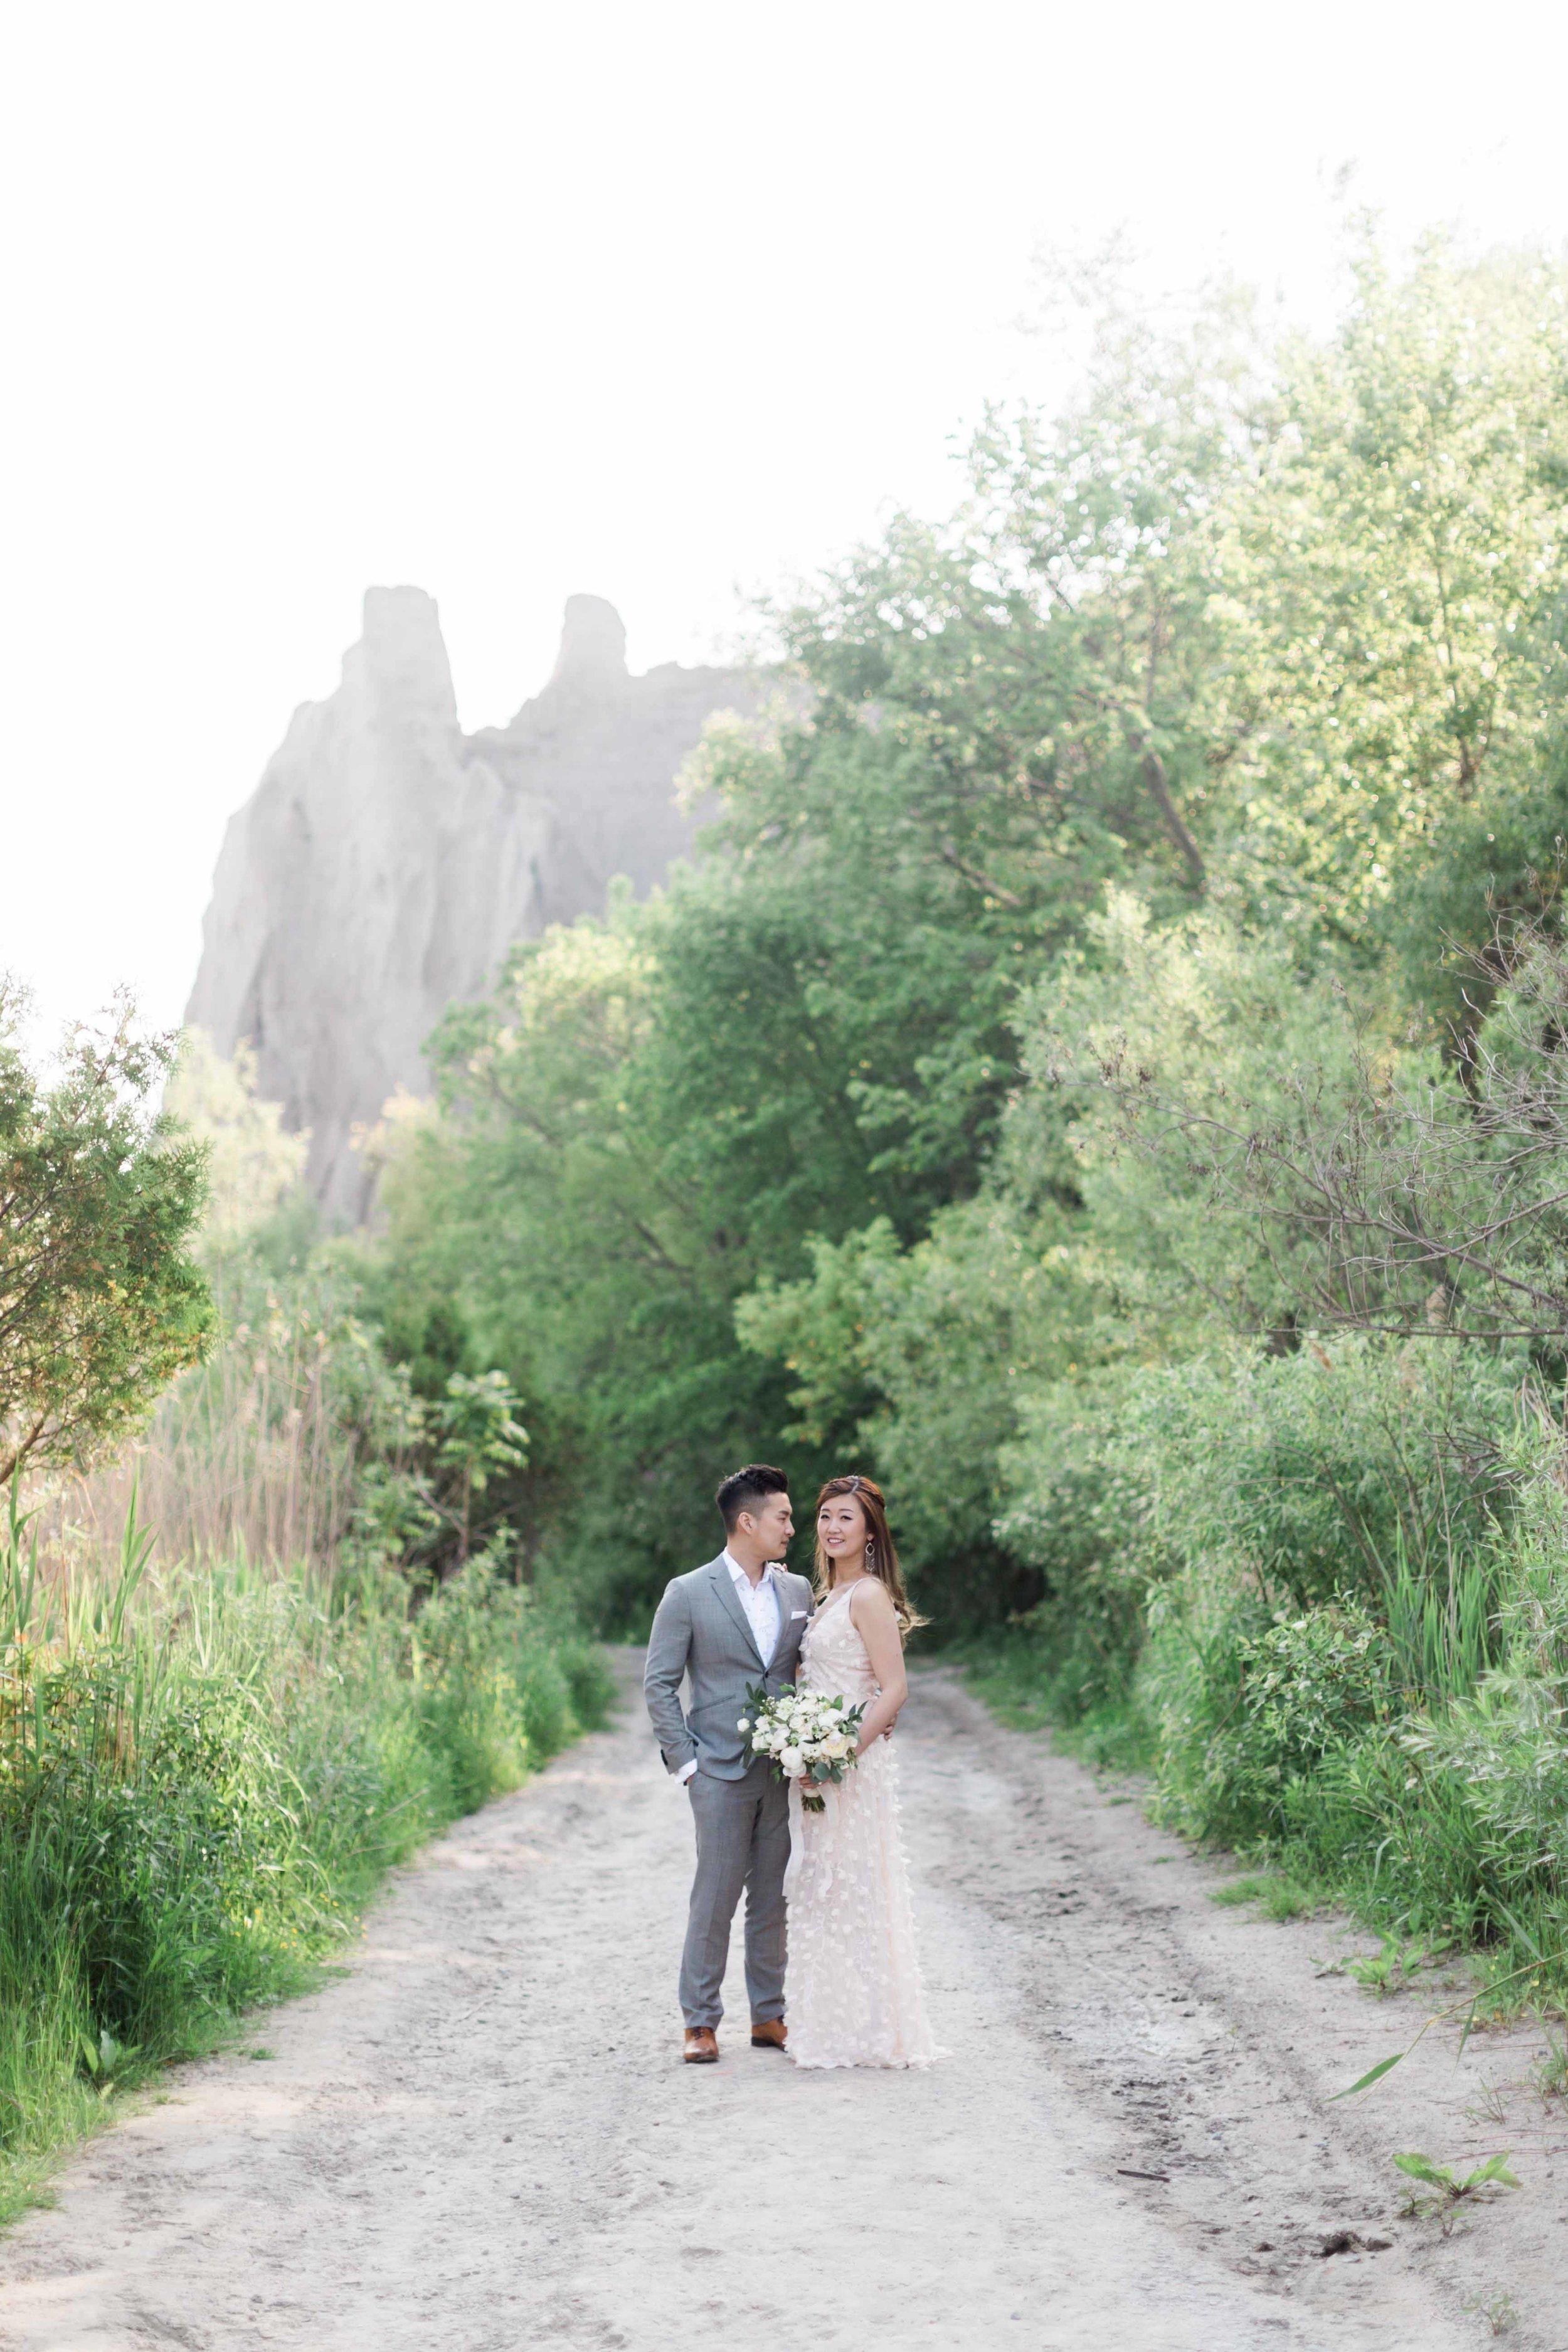 Cari Zhu Fine Art Photographer - Scarborough Bluffs Engagement Session-1.jpg